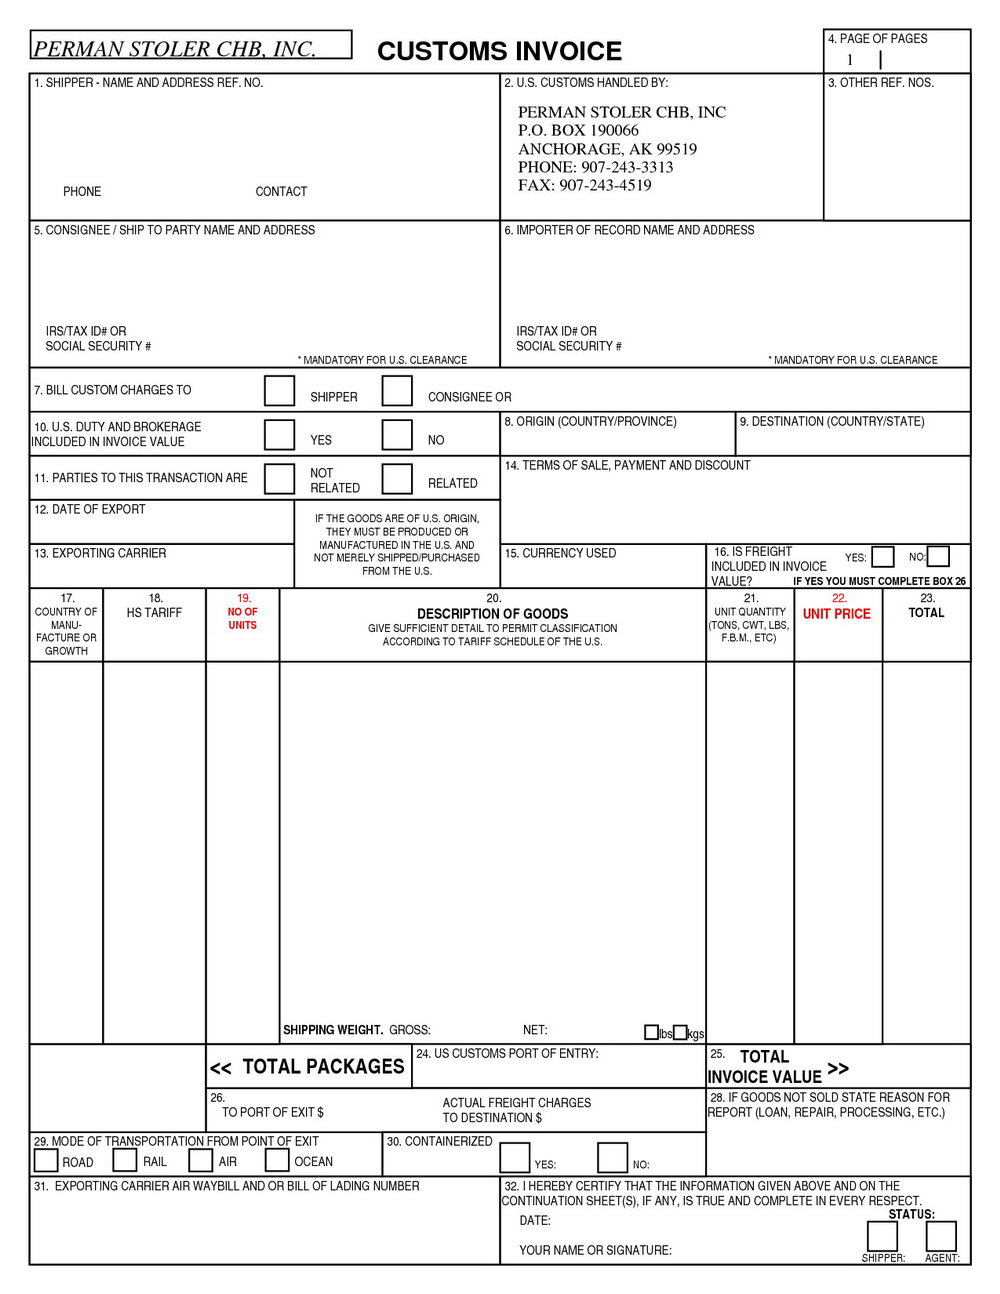 Customs Invoice Template